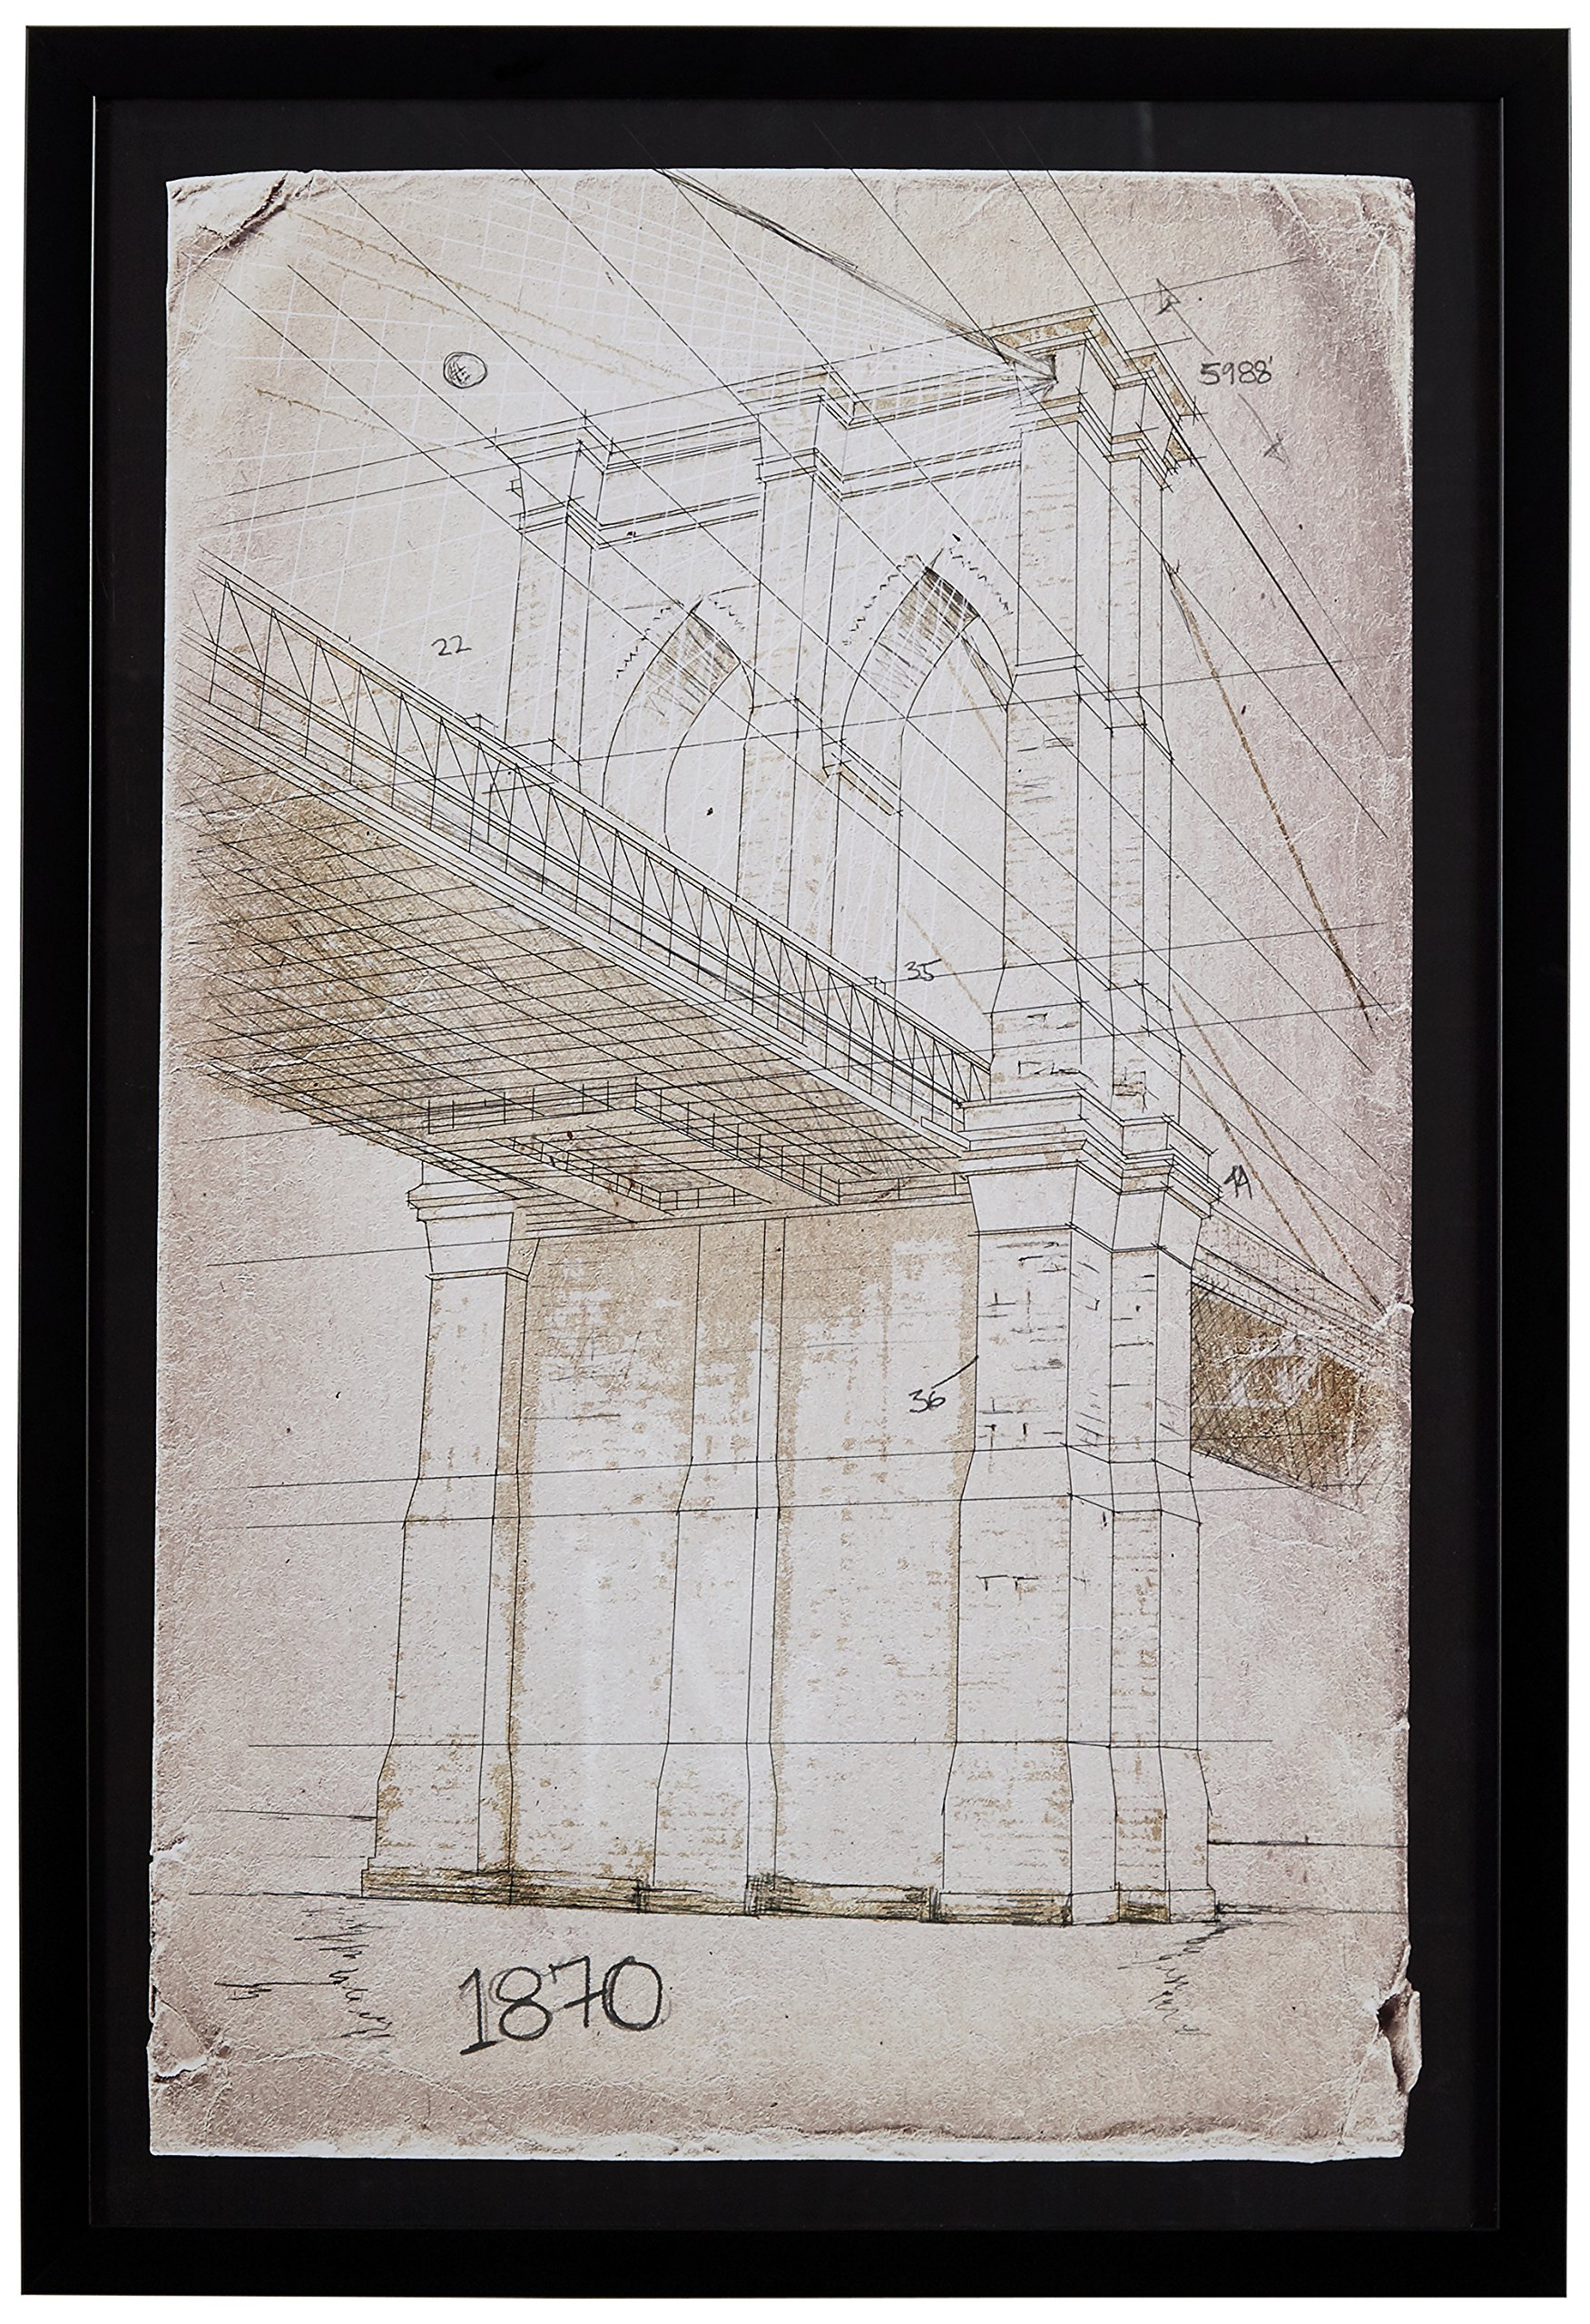 Modern Print of Brooklyn Bridge Sketch, Black Frame, 18'' x 26'' by Stone & Beam